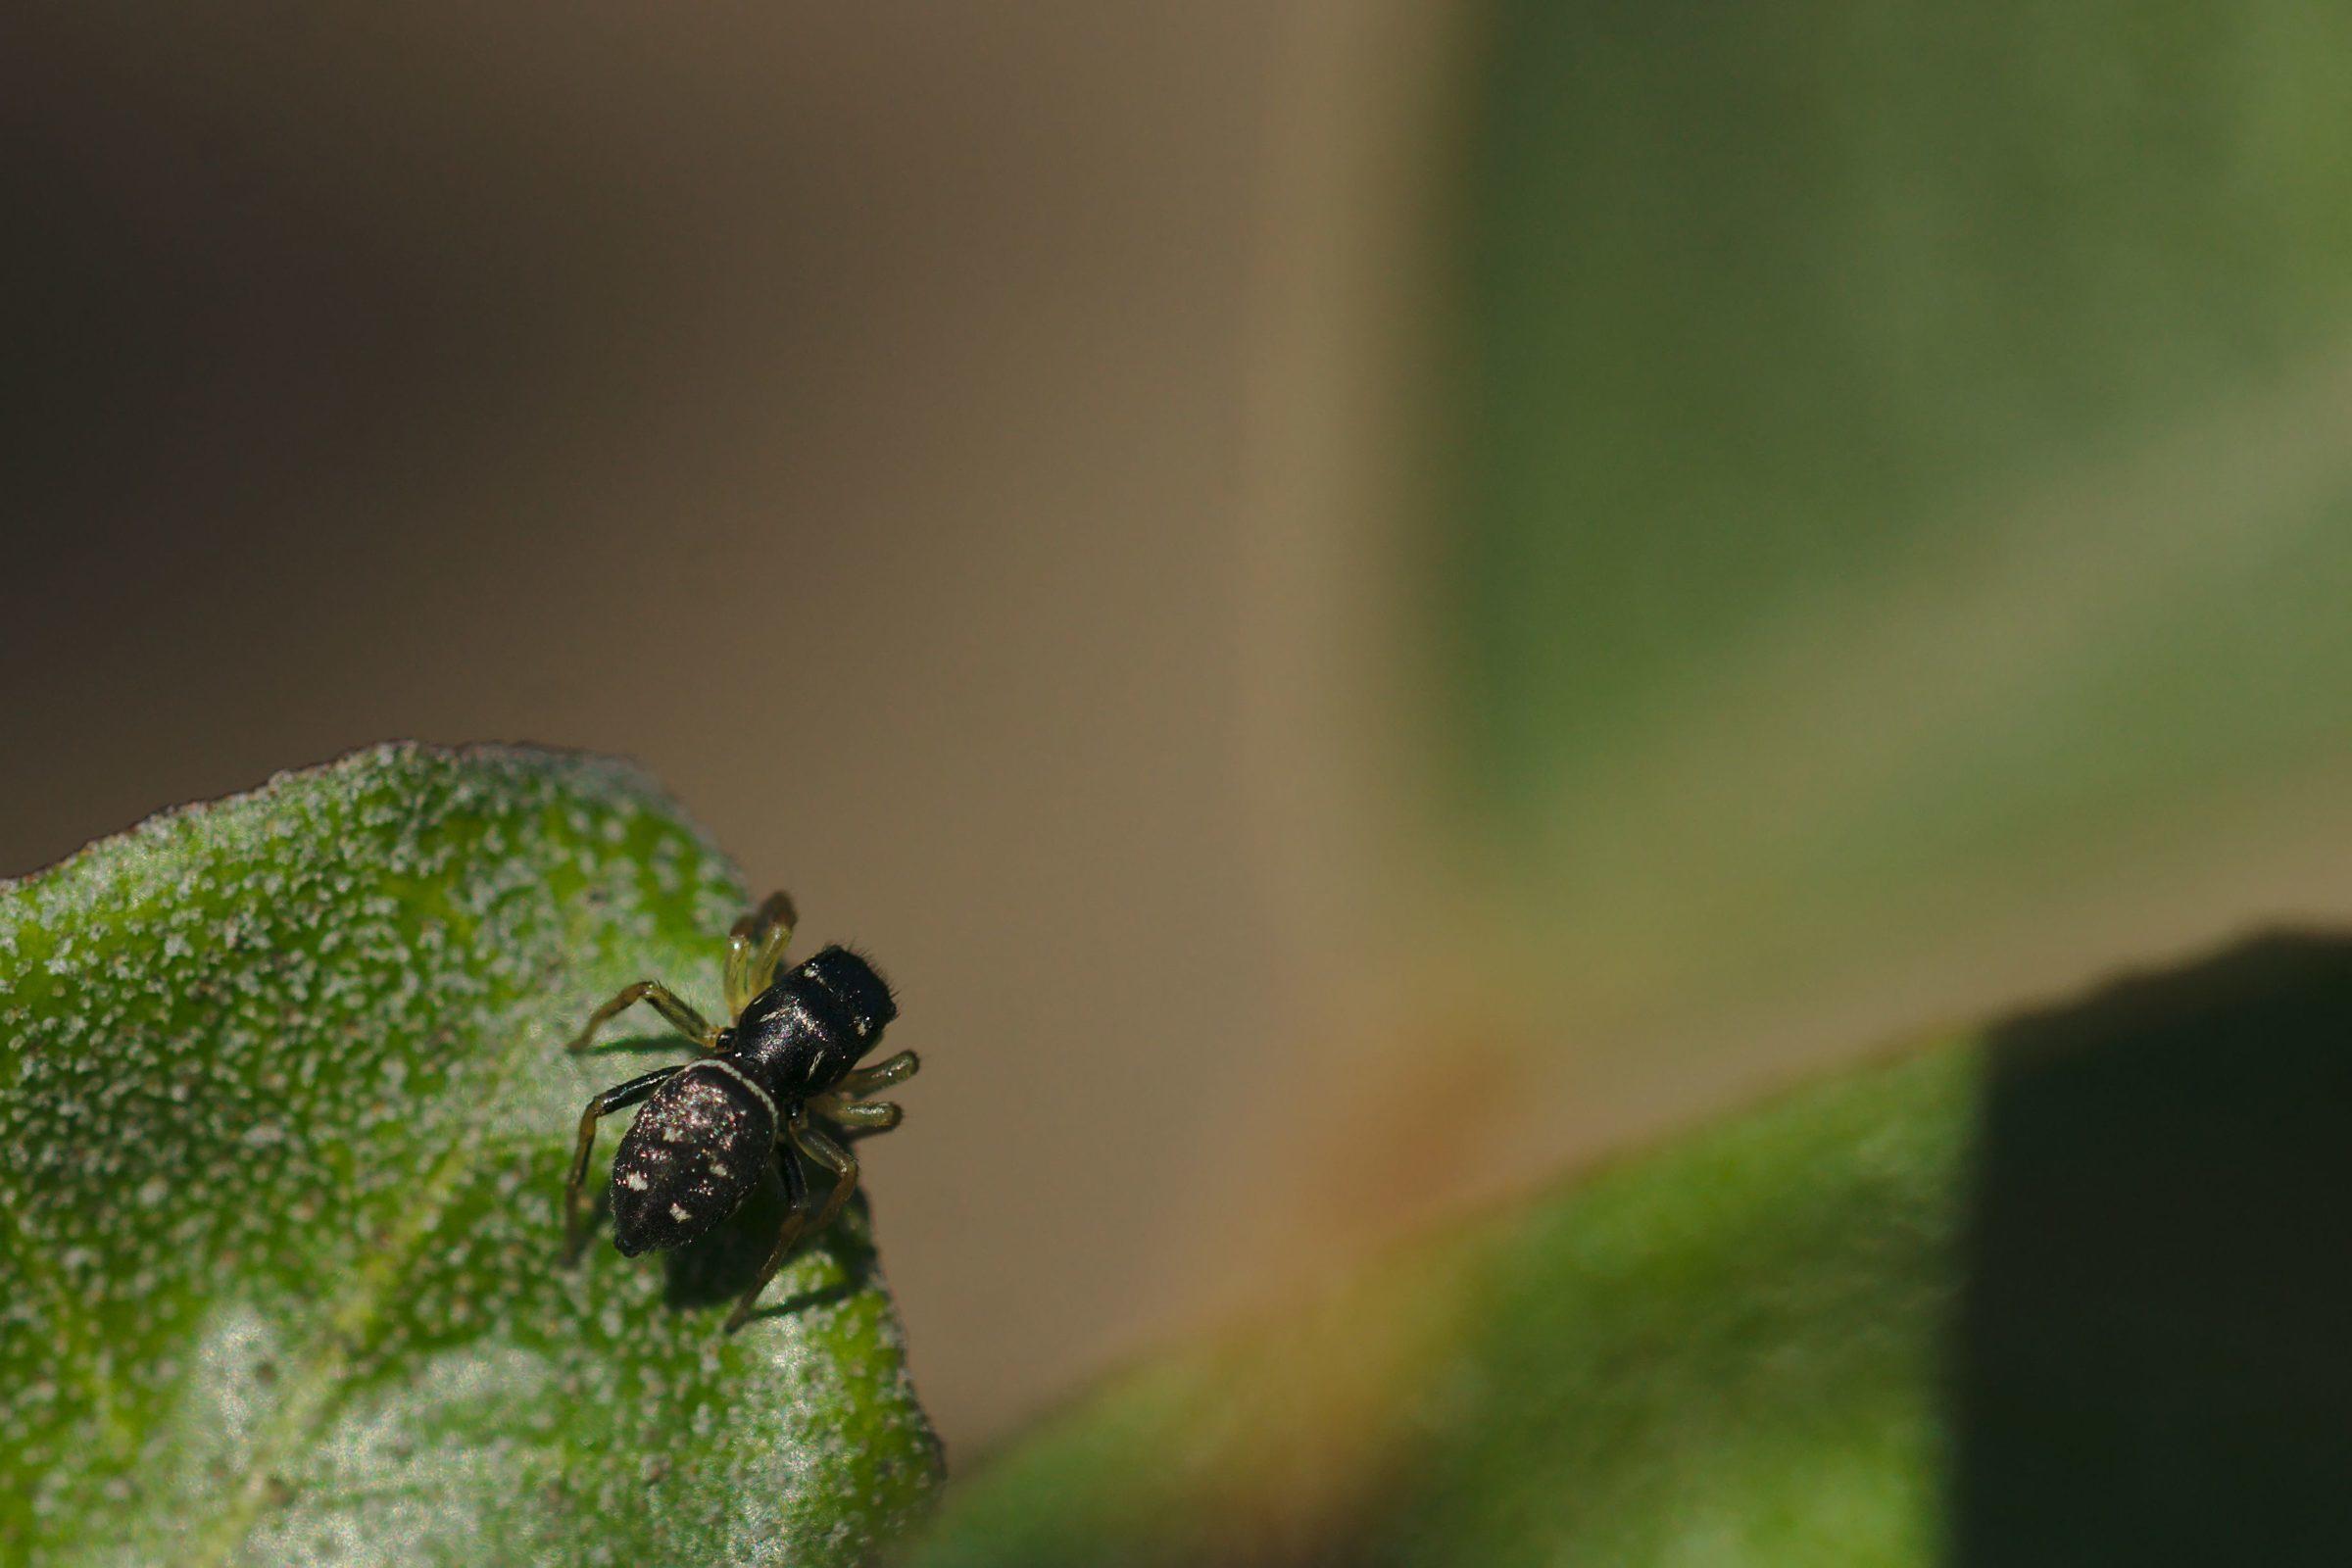 "<a href=""/heliophanus-cupreus/"" target=""_blank"" rel=""noopener noreferrer""><i>Heliophanus cupreus</i> (Kupfrige Sonnenspringspinne)</a>"